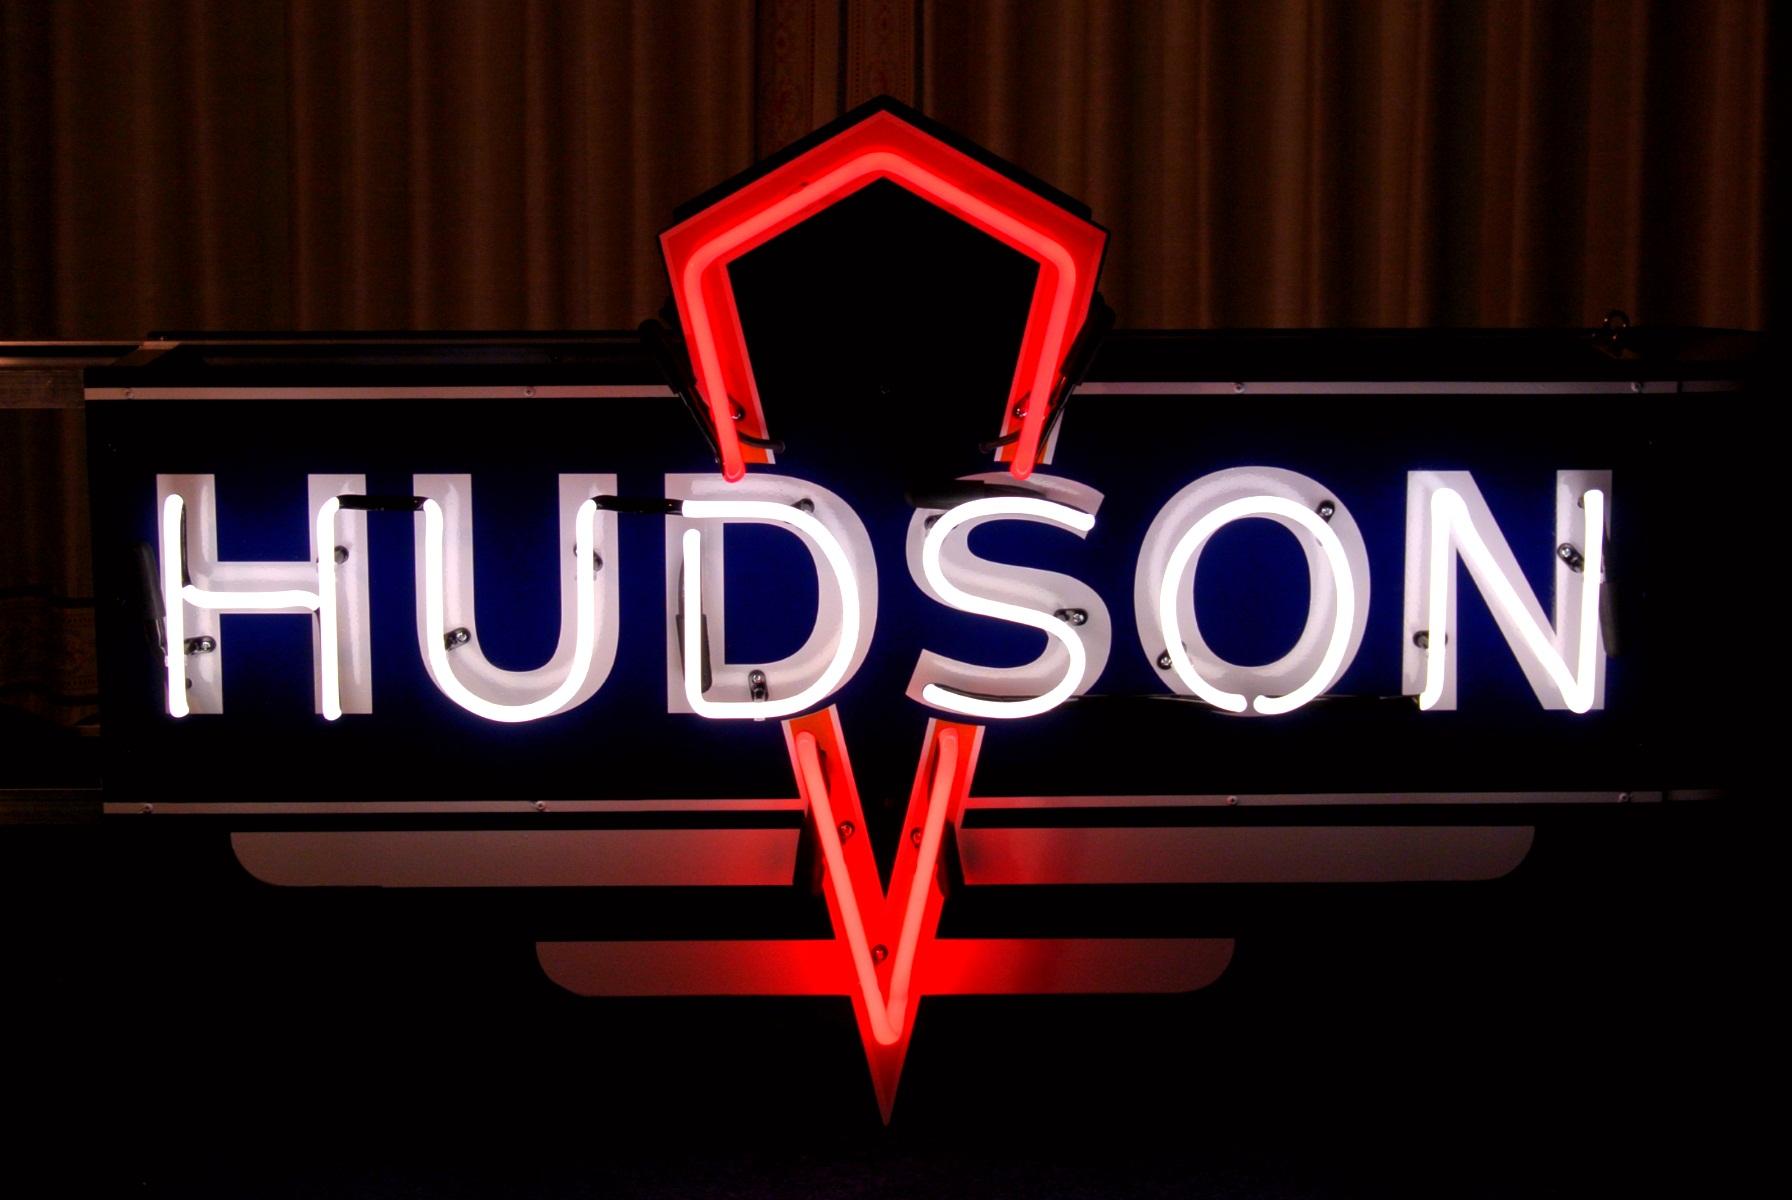 Hudson Car Dealership Neon Signs by John Barton - BartonNeonMagic.com